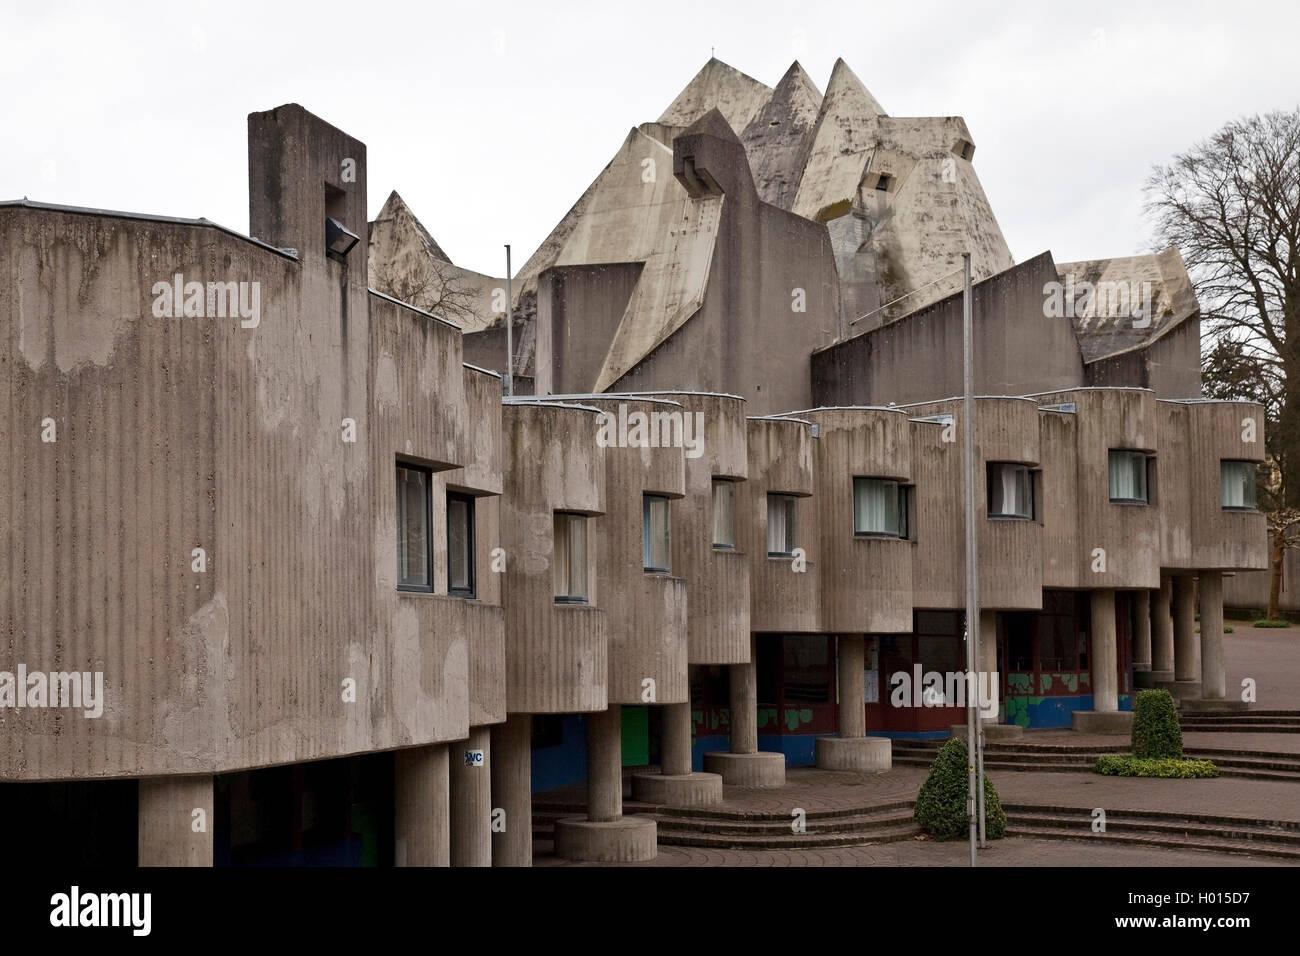 Brutalismus stockfotos brutalismus bilder alamy for Architektur brutalismus